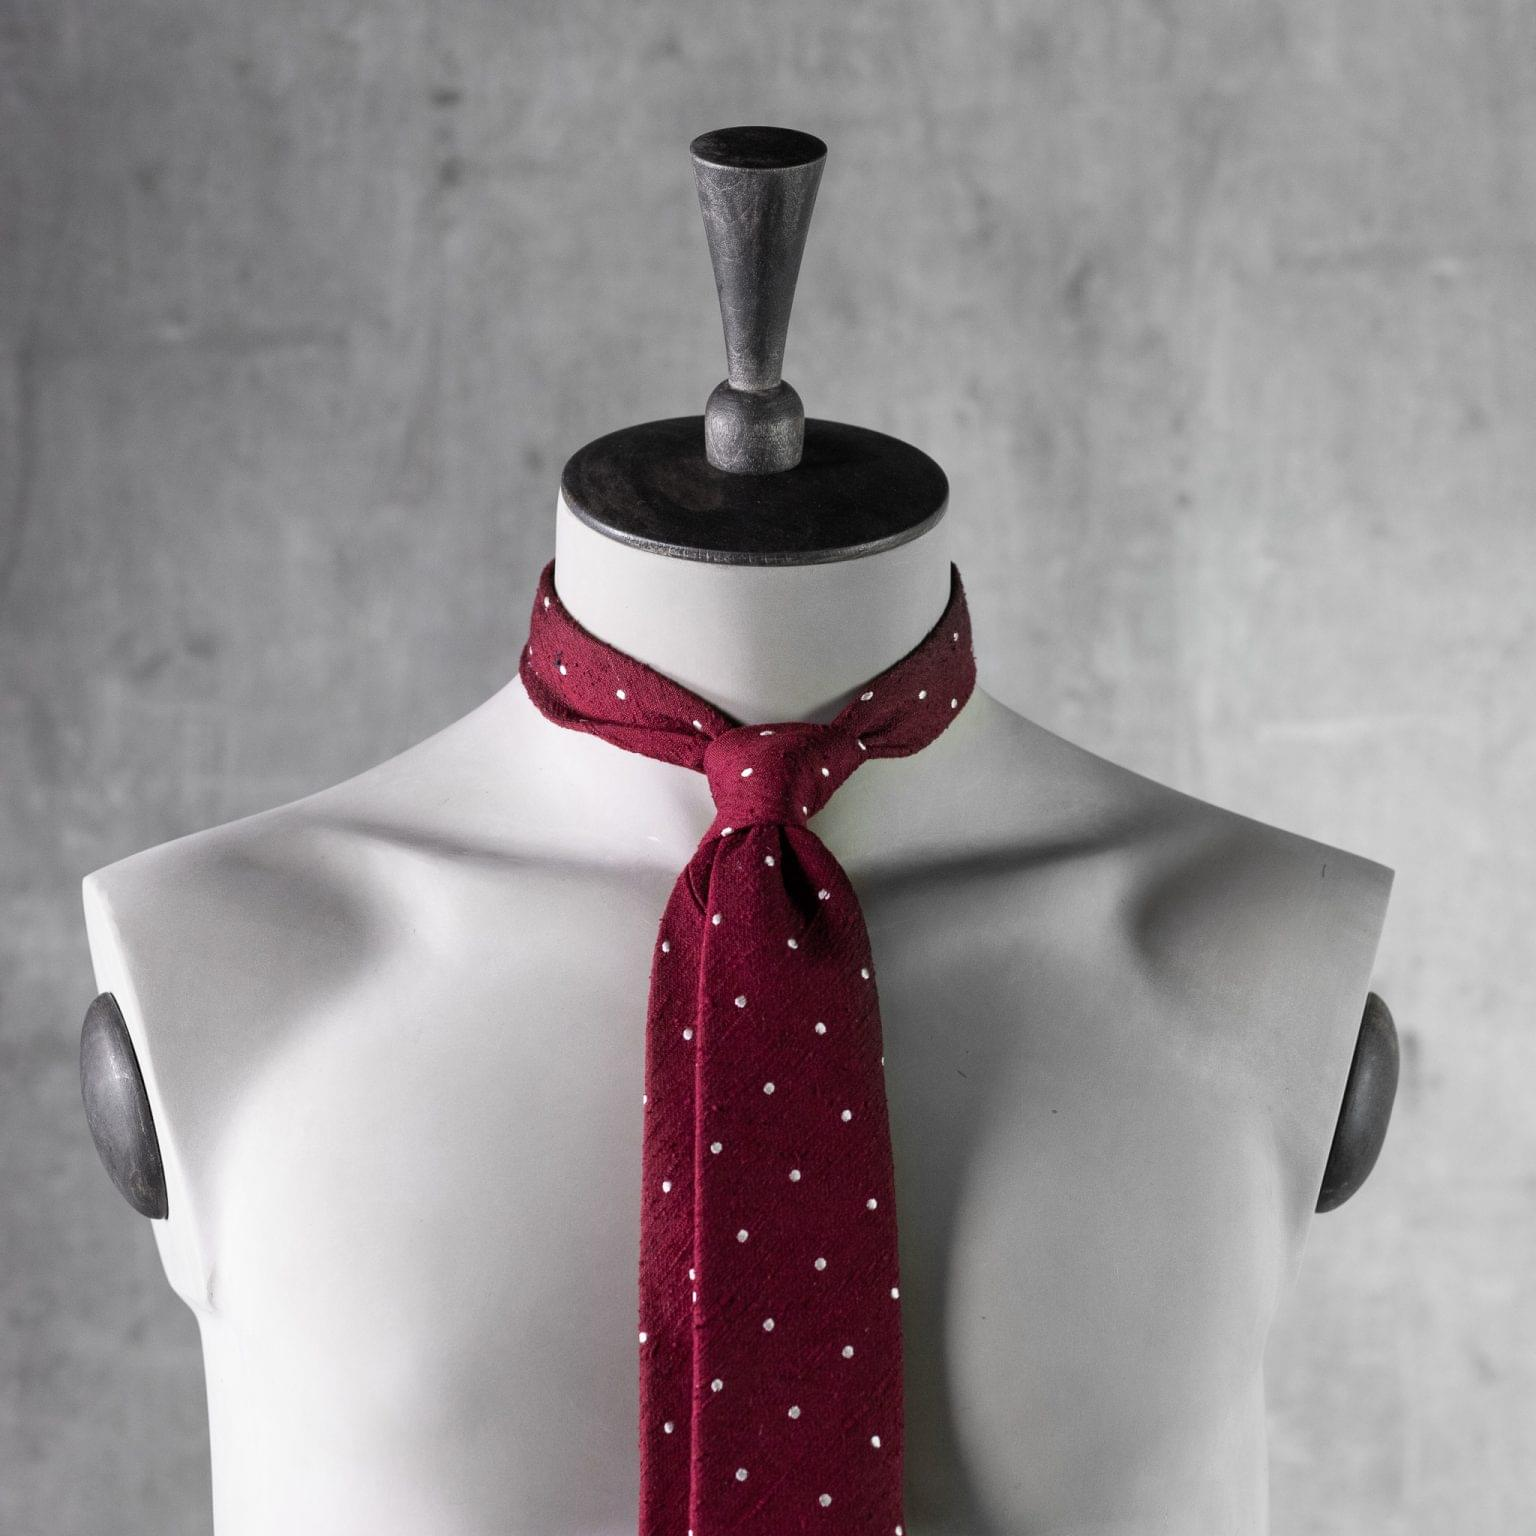 SHANTUNG-0528-Tie-Initials-Corbata-Iniciales-The-Seelk-3